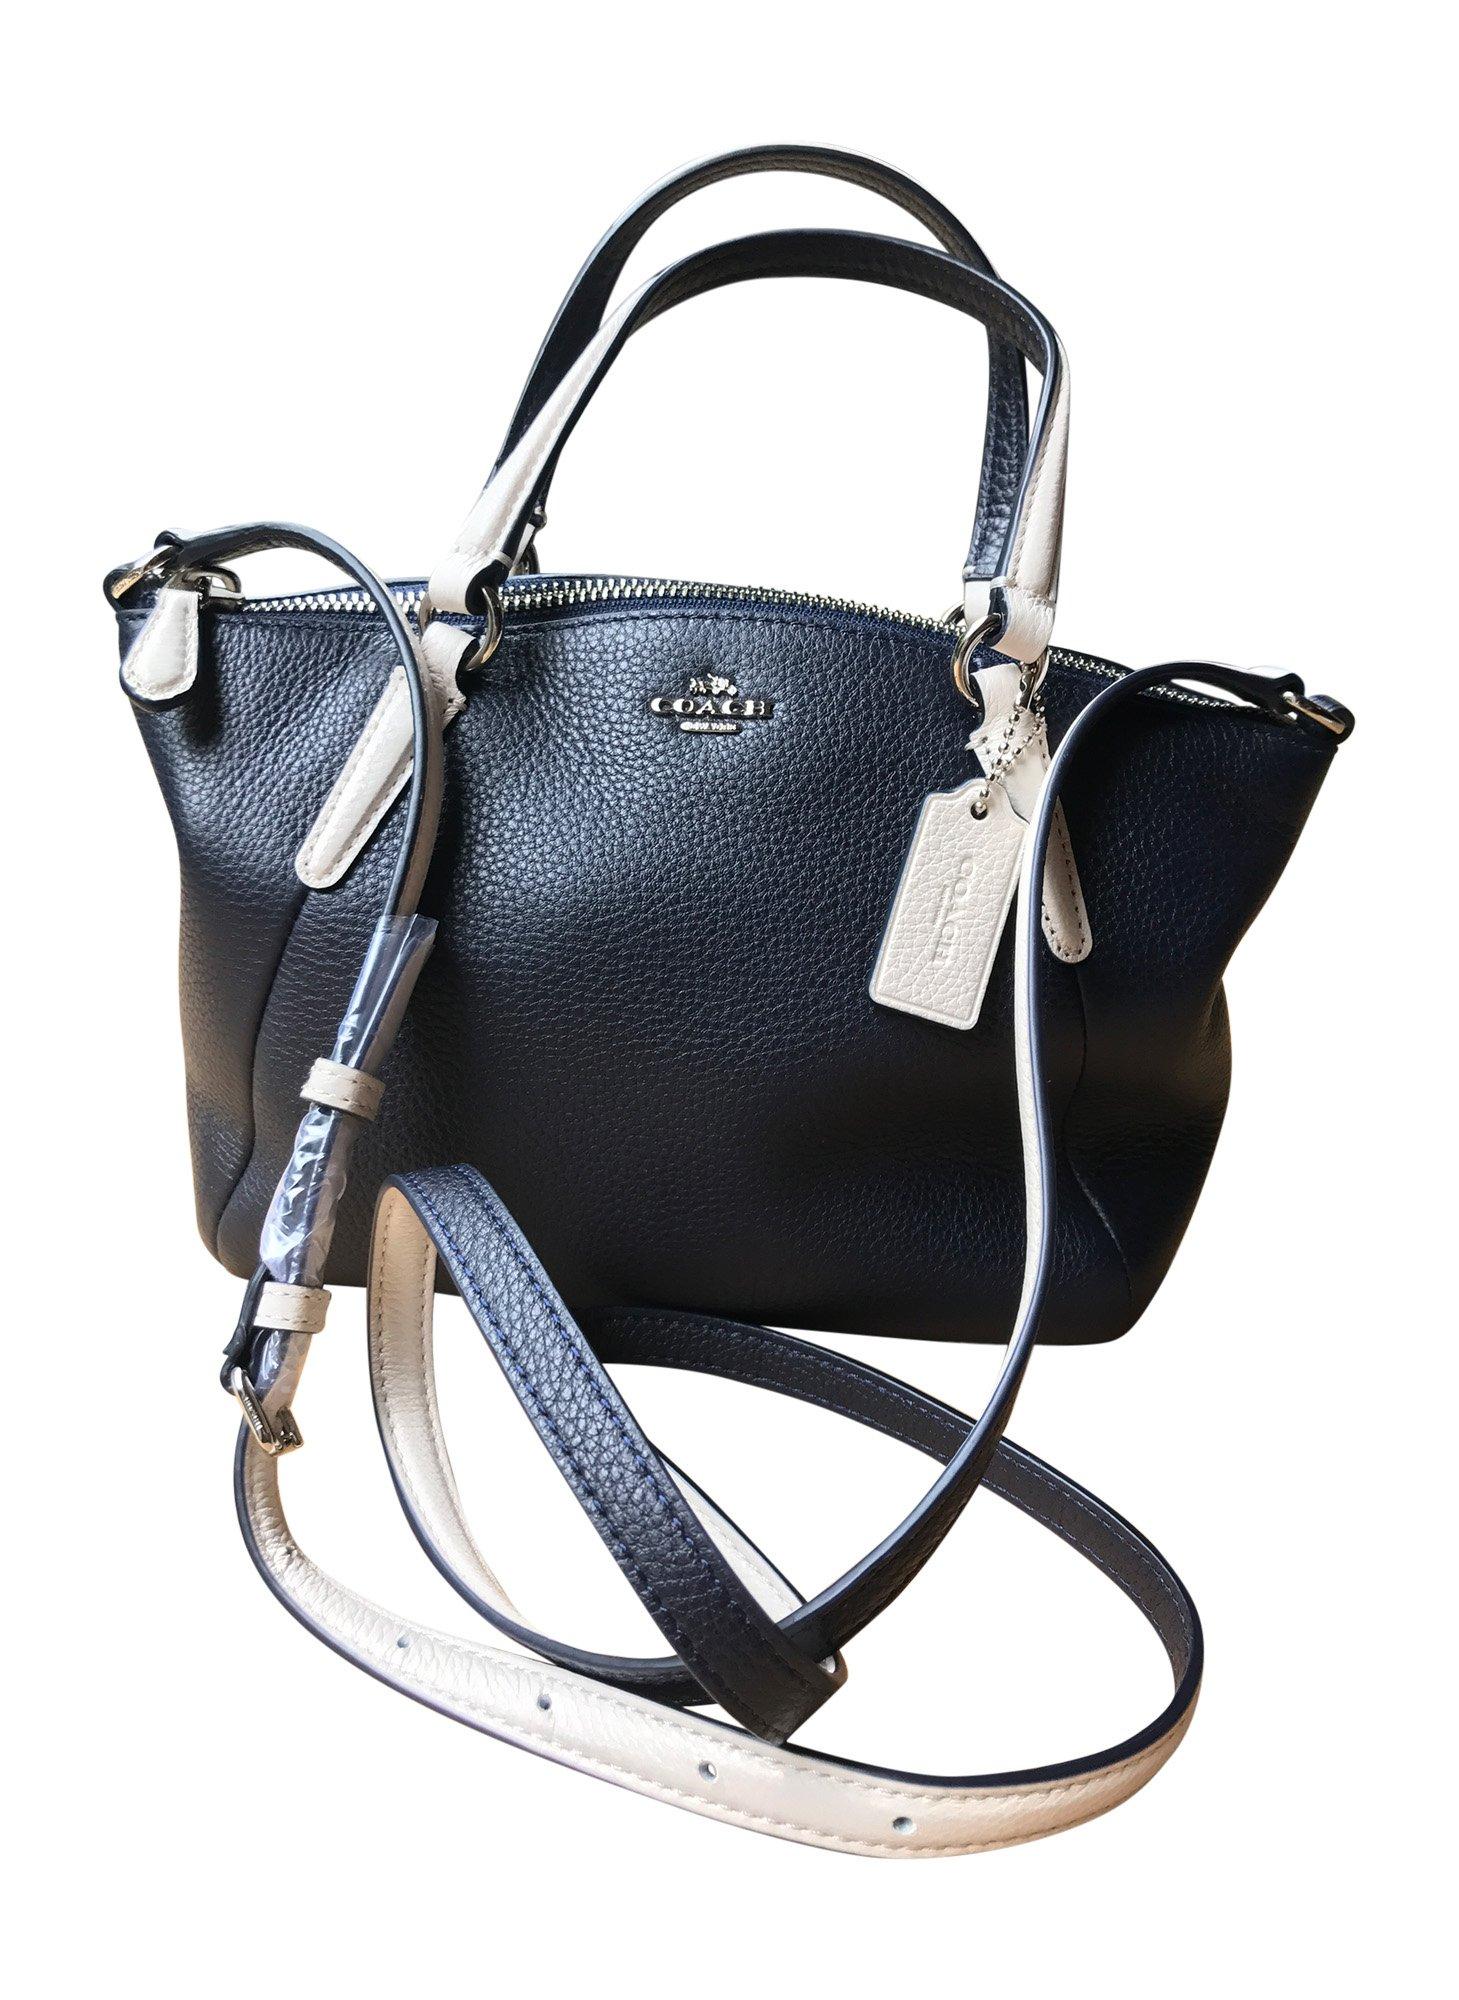 Galleon - Coach Pebble Leather Mini Kelsey Satchel Crossbody Handbag,  Silver, Midnight, Chalk f39ae376e0